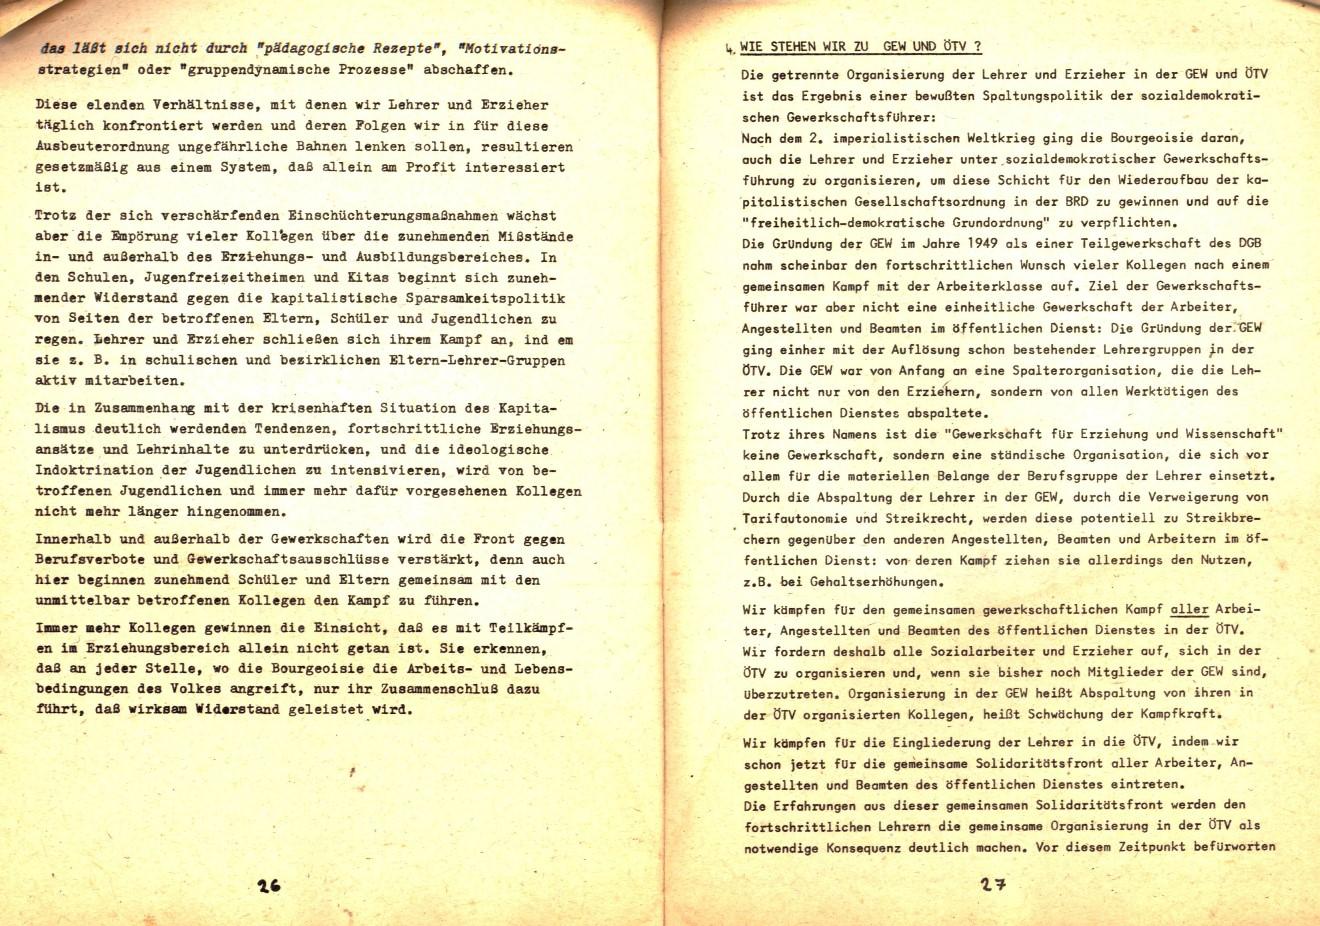 Berlin_BSLE_1975_Grundlagenpapier_15